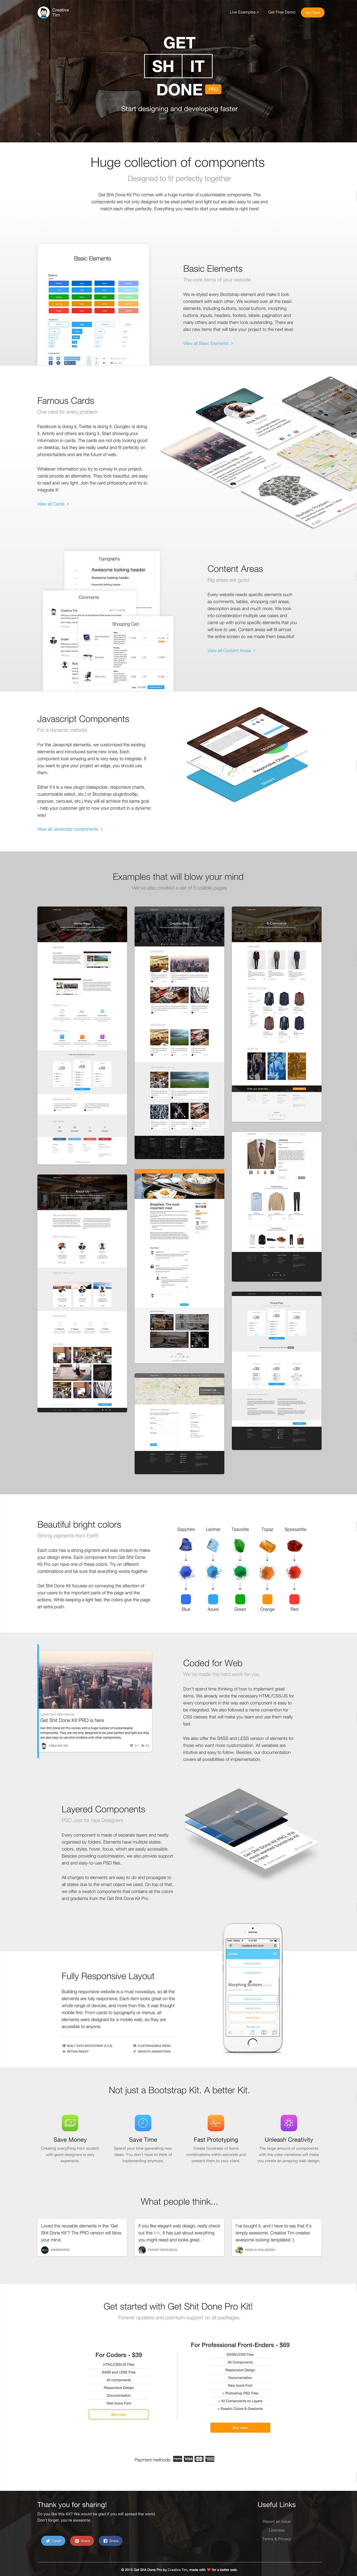 Get Shit Done Kit Pro Website Screenshot